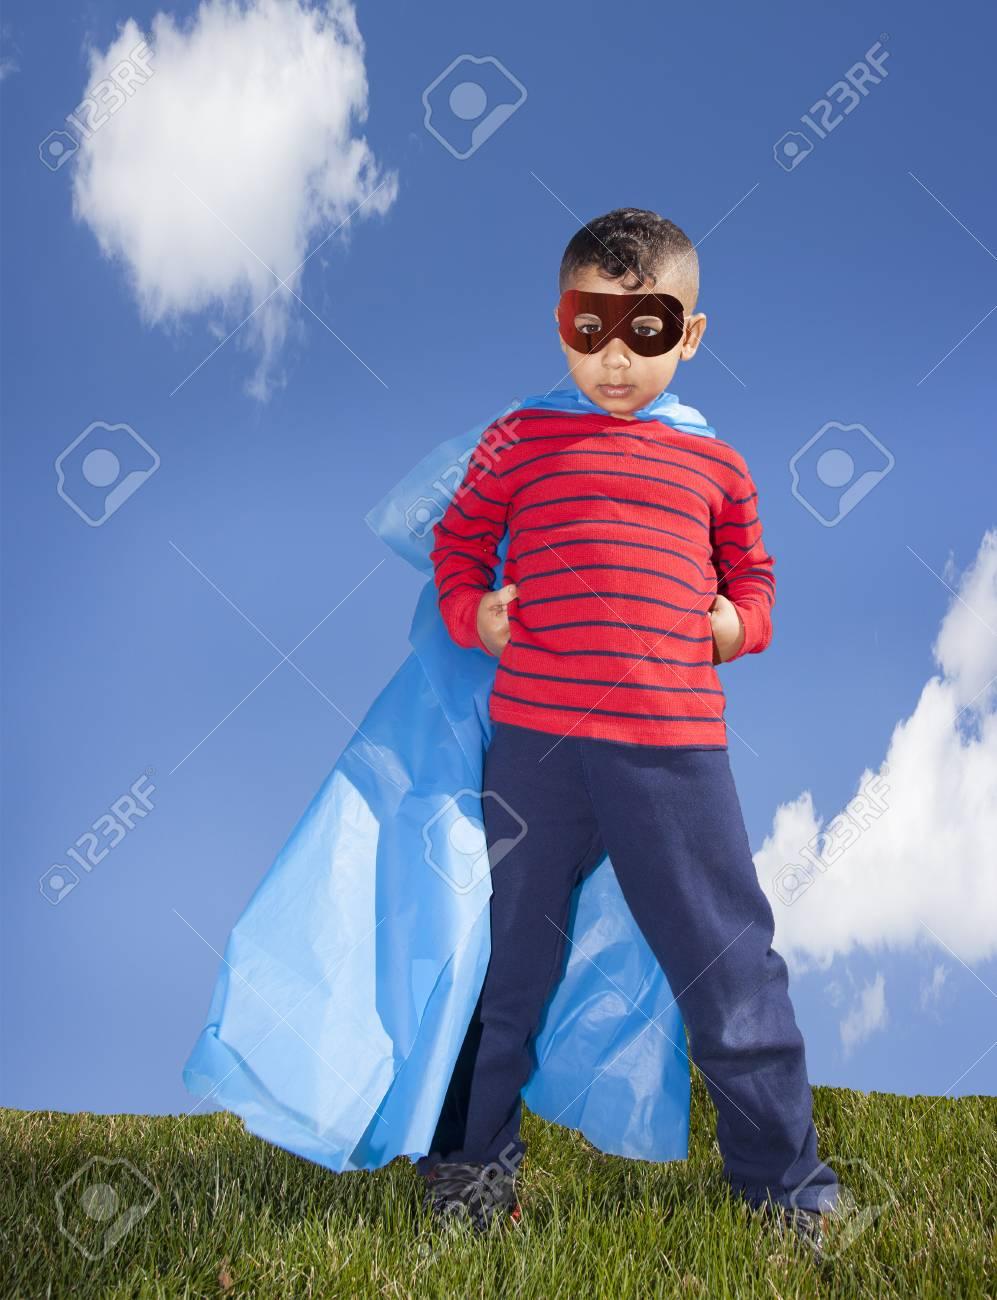 little boy superhero against blue sky - 39762084